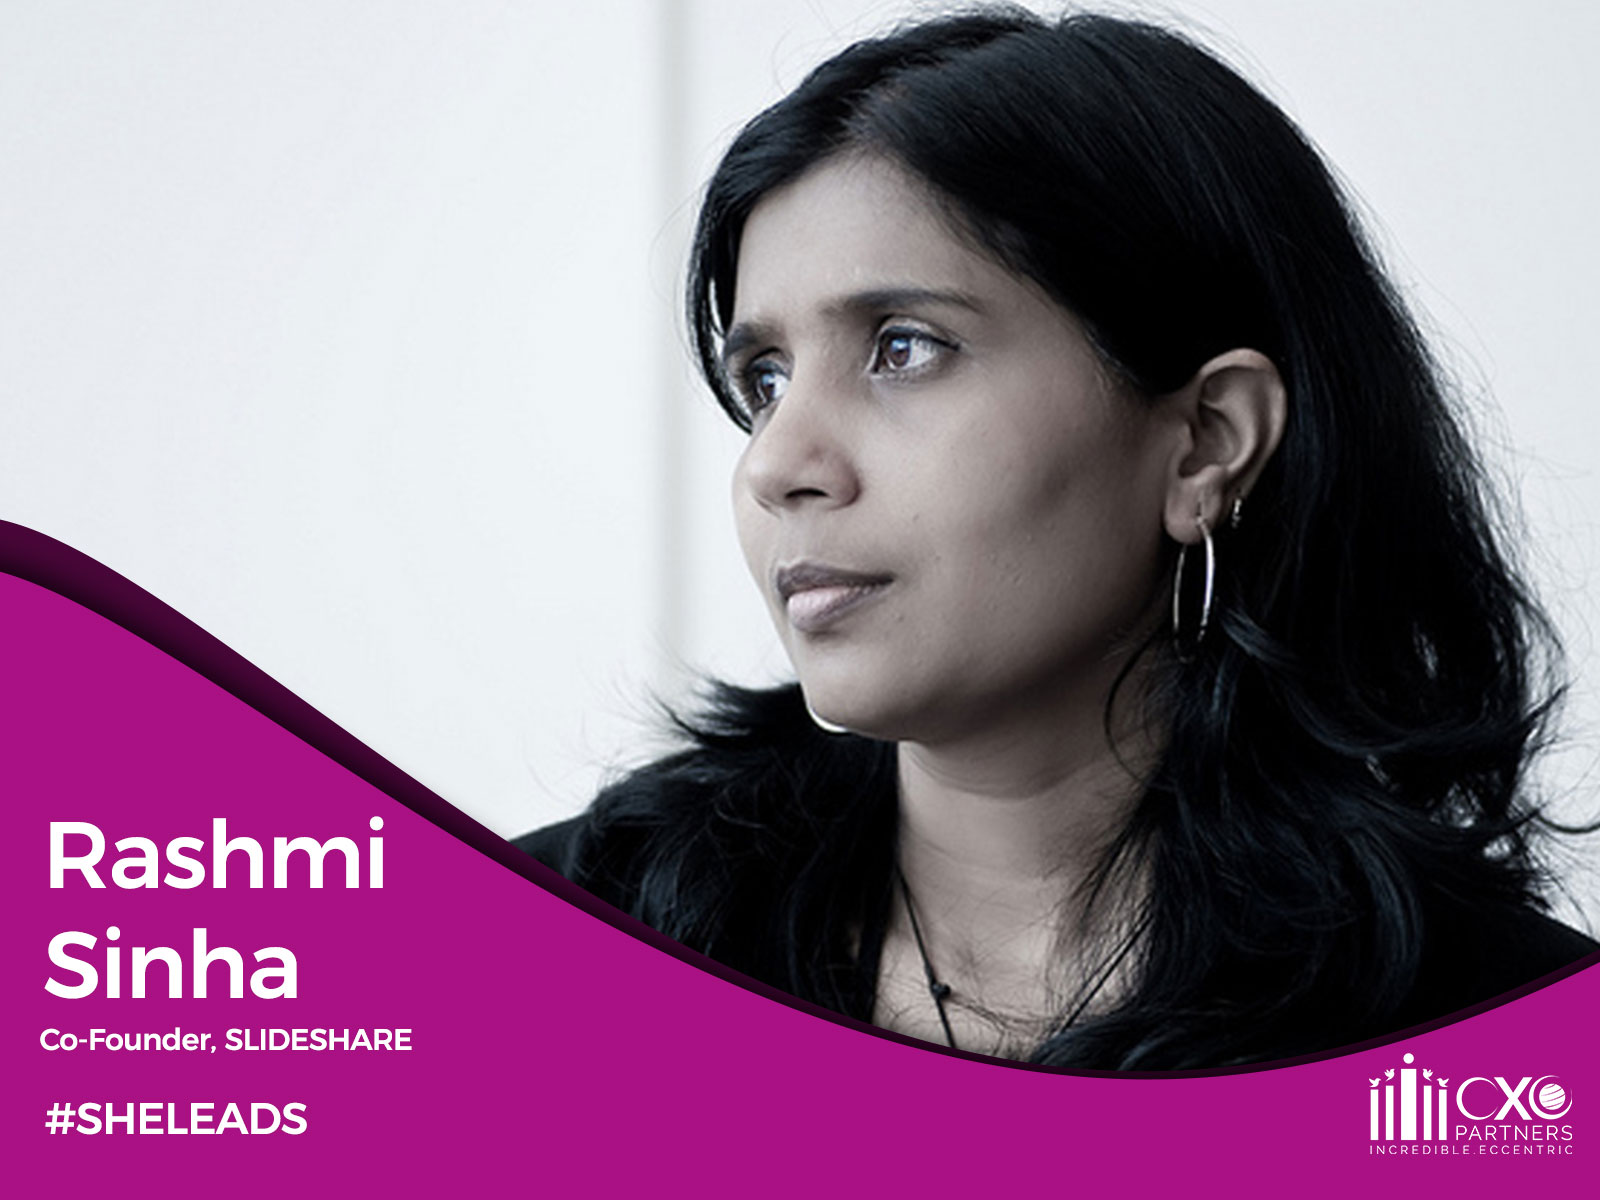 Rashmi Sinha Slideshare Sheleads